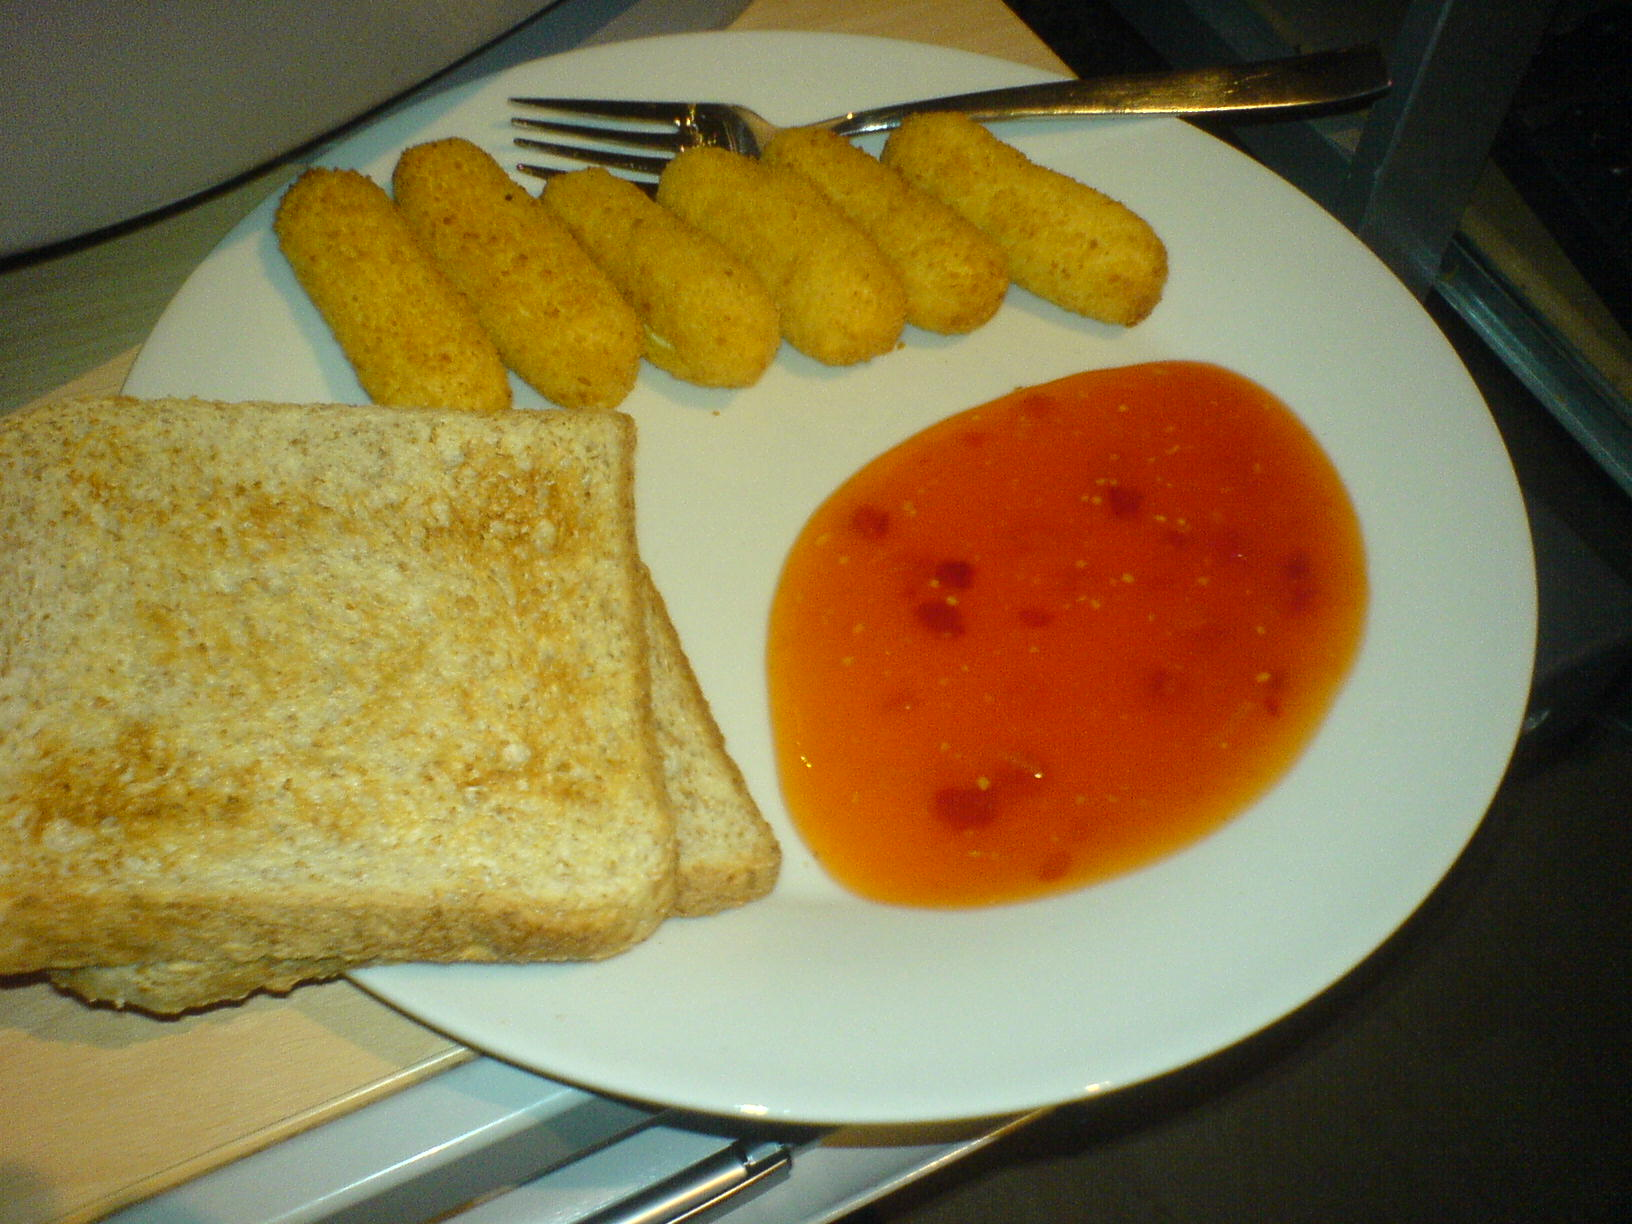 http://foodloader.net/Holz_2009-05-01_Frischkaese-Sticks_mit_Toasts.jpg